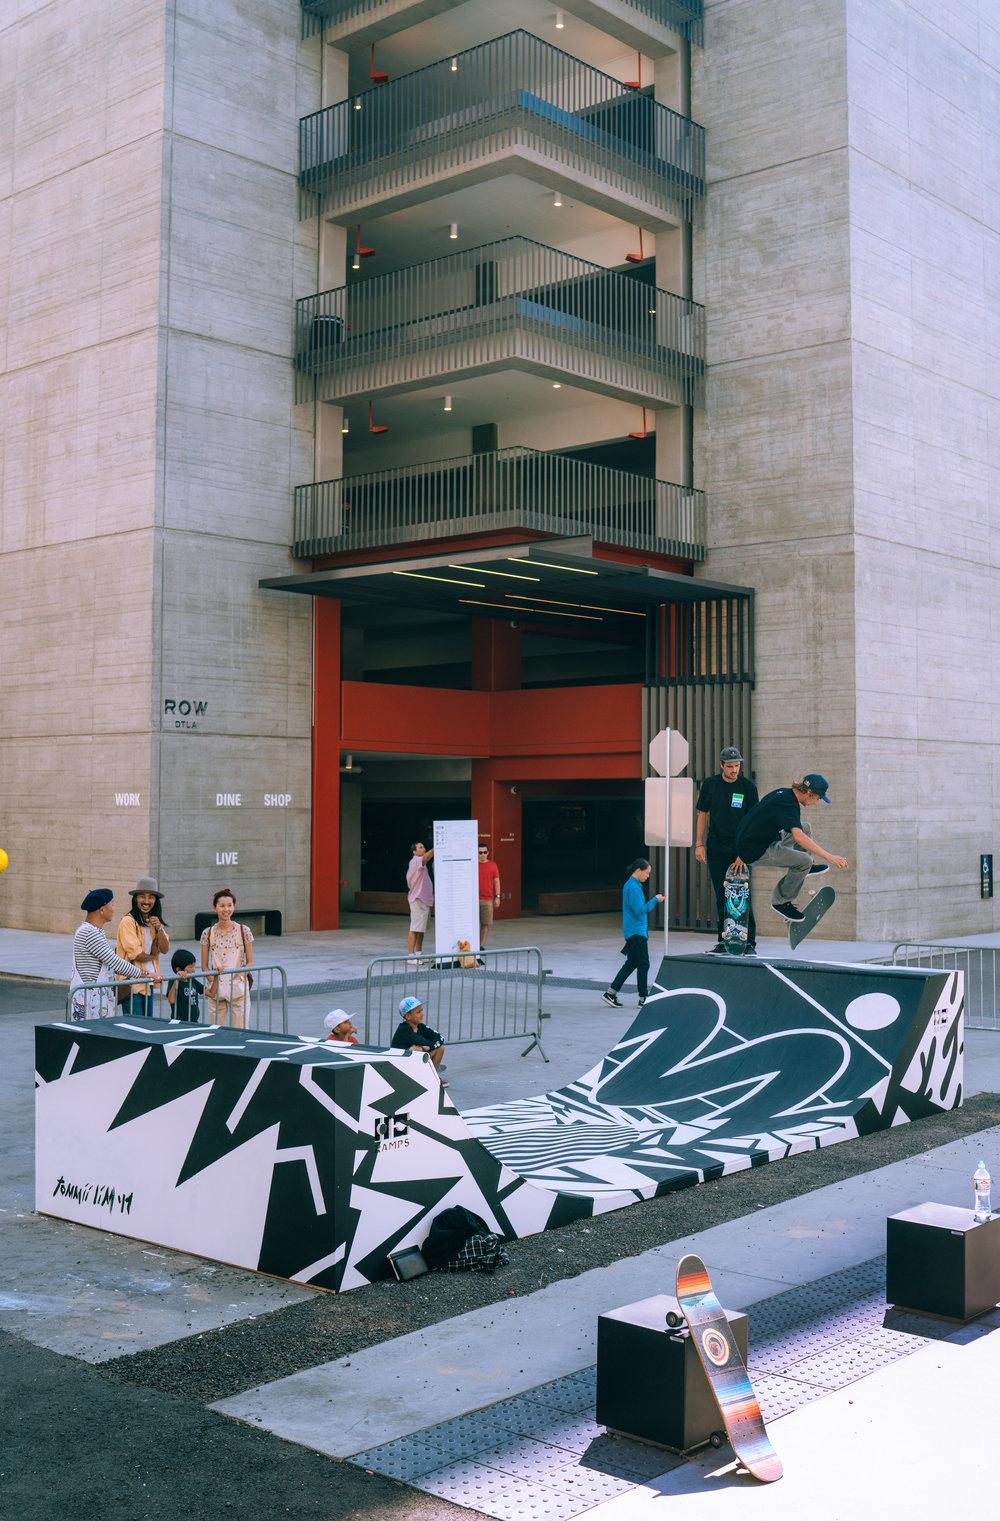 Tommii Lim - DFM_Row DTLA Skate boarder B-1 .jpg